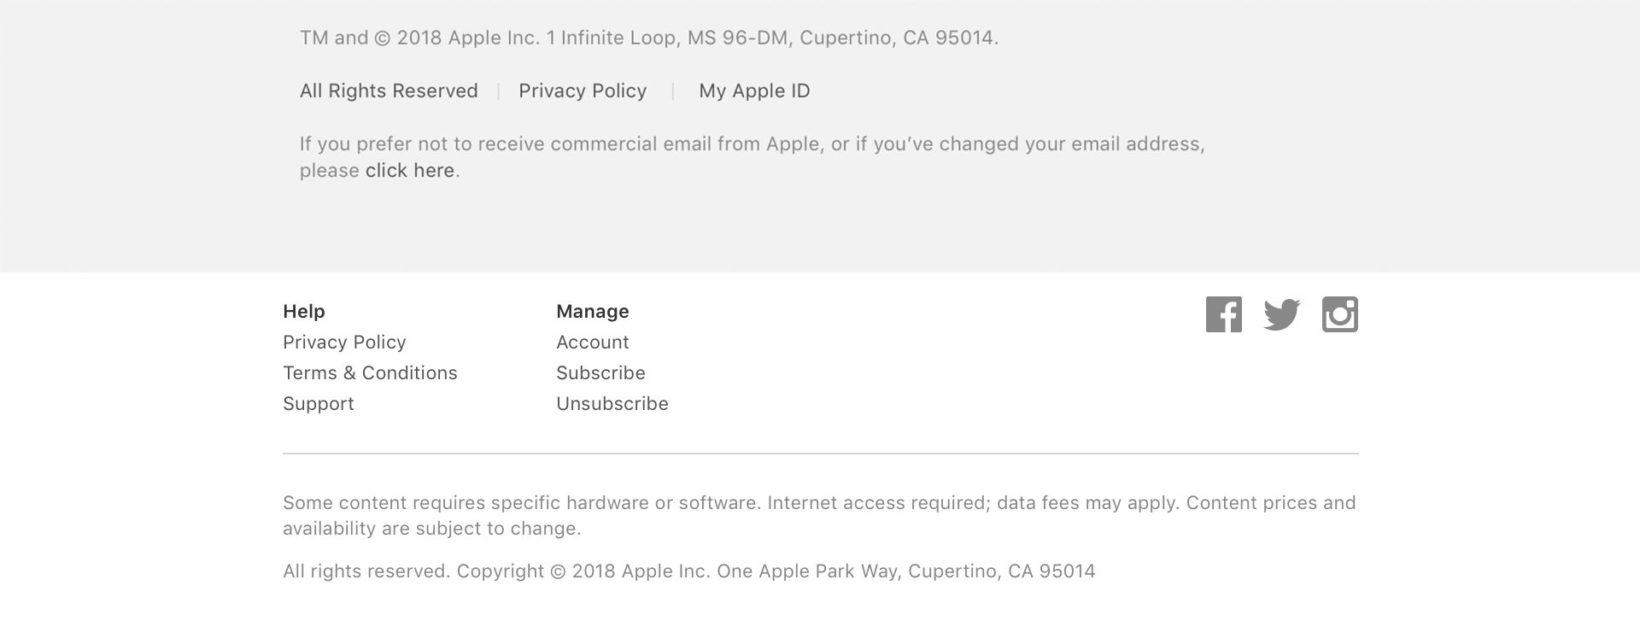 One Apple Park Way sede legale apple